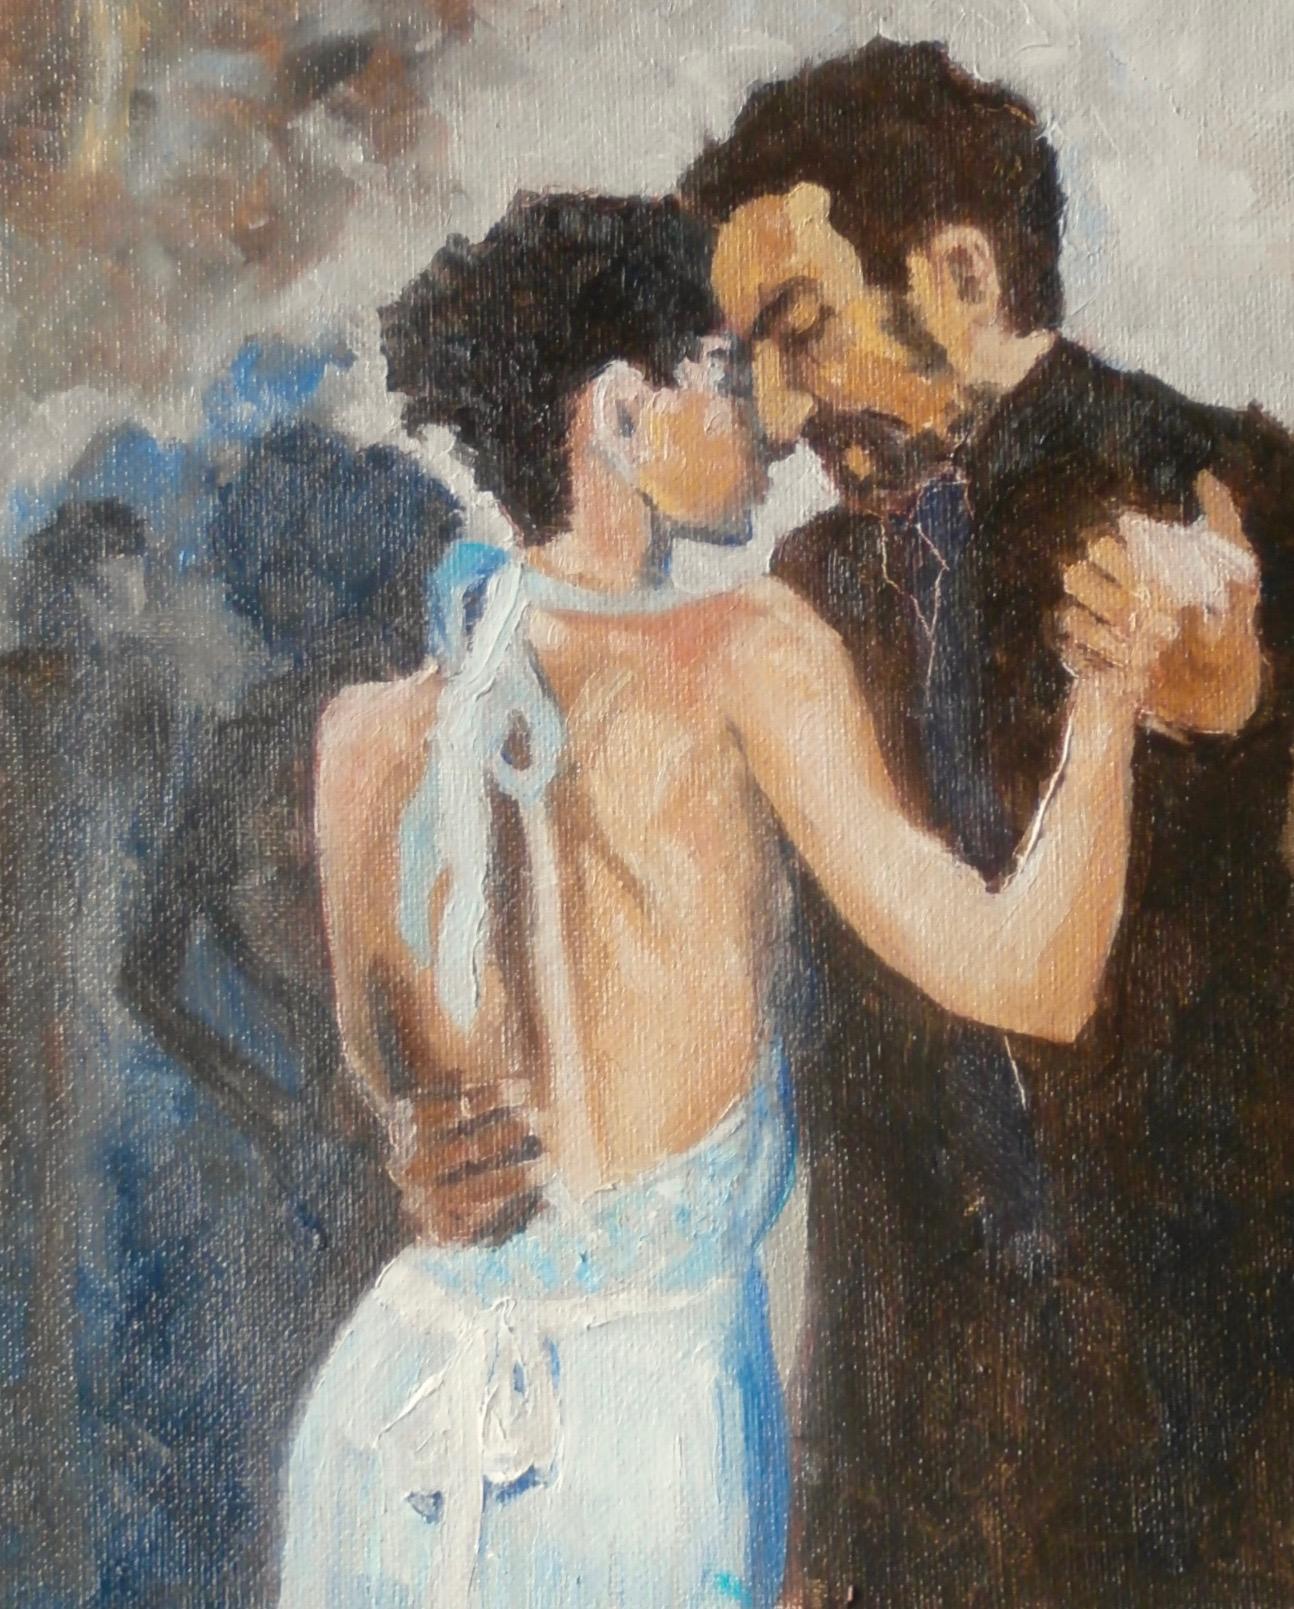 The Reader Gallery: Dance 'til Dawn - Paul Scragg